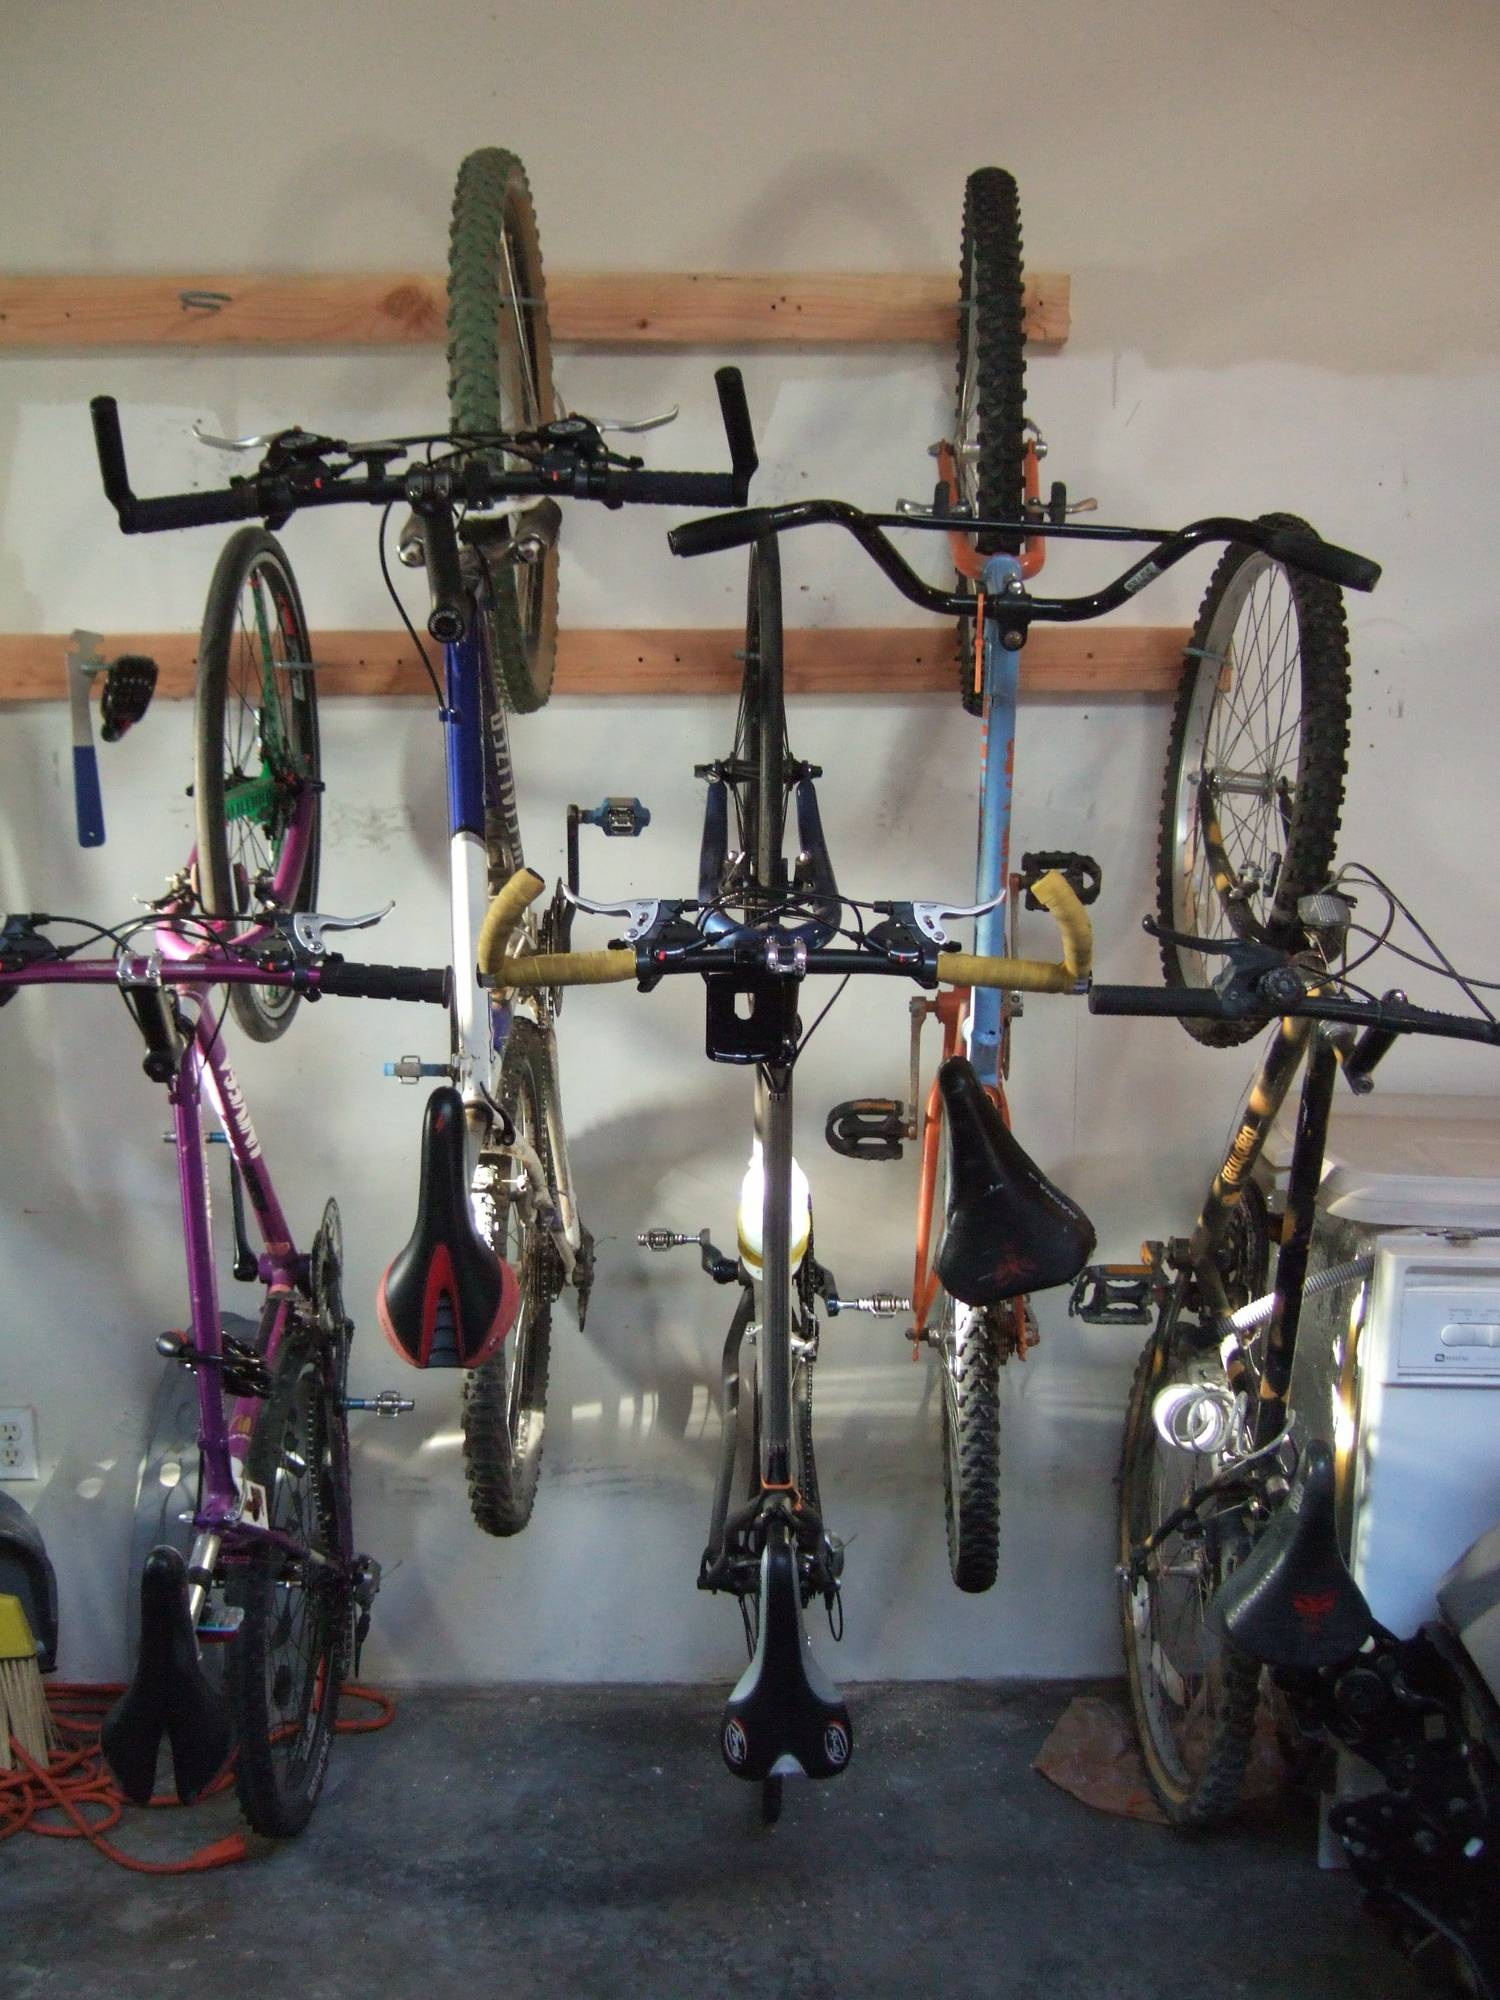 6 BIKE Hanging HOOKS Storage Bicycle LARGE Steel PVC Wall Hanger Brackets Rack